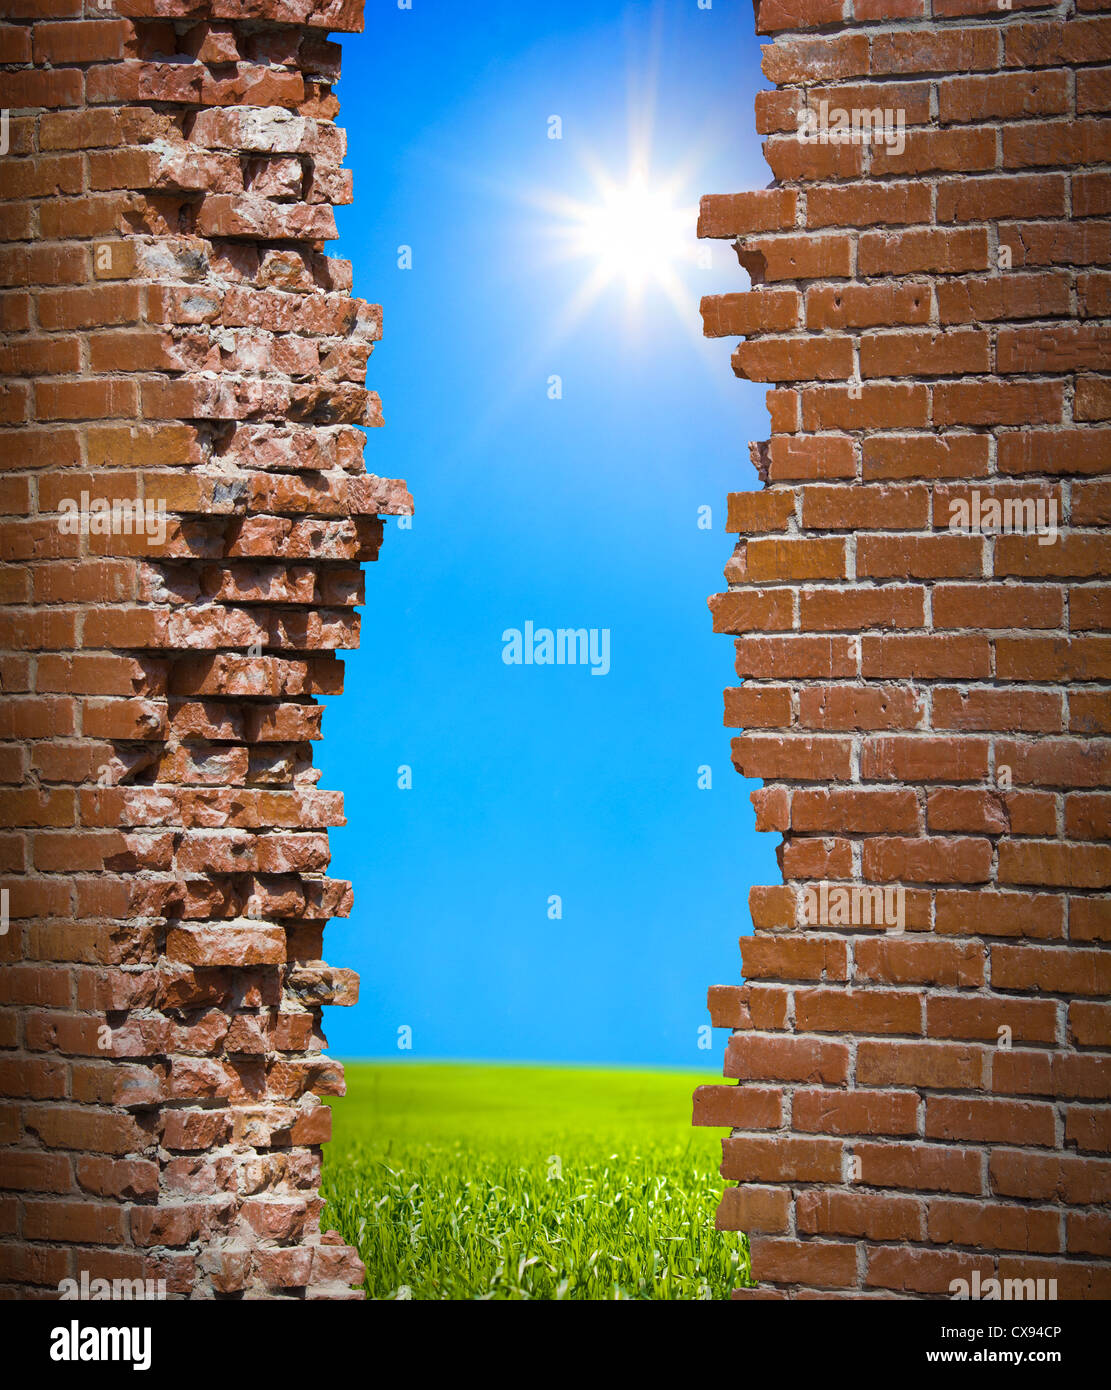 Broken wall freedom concept - Stock Image